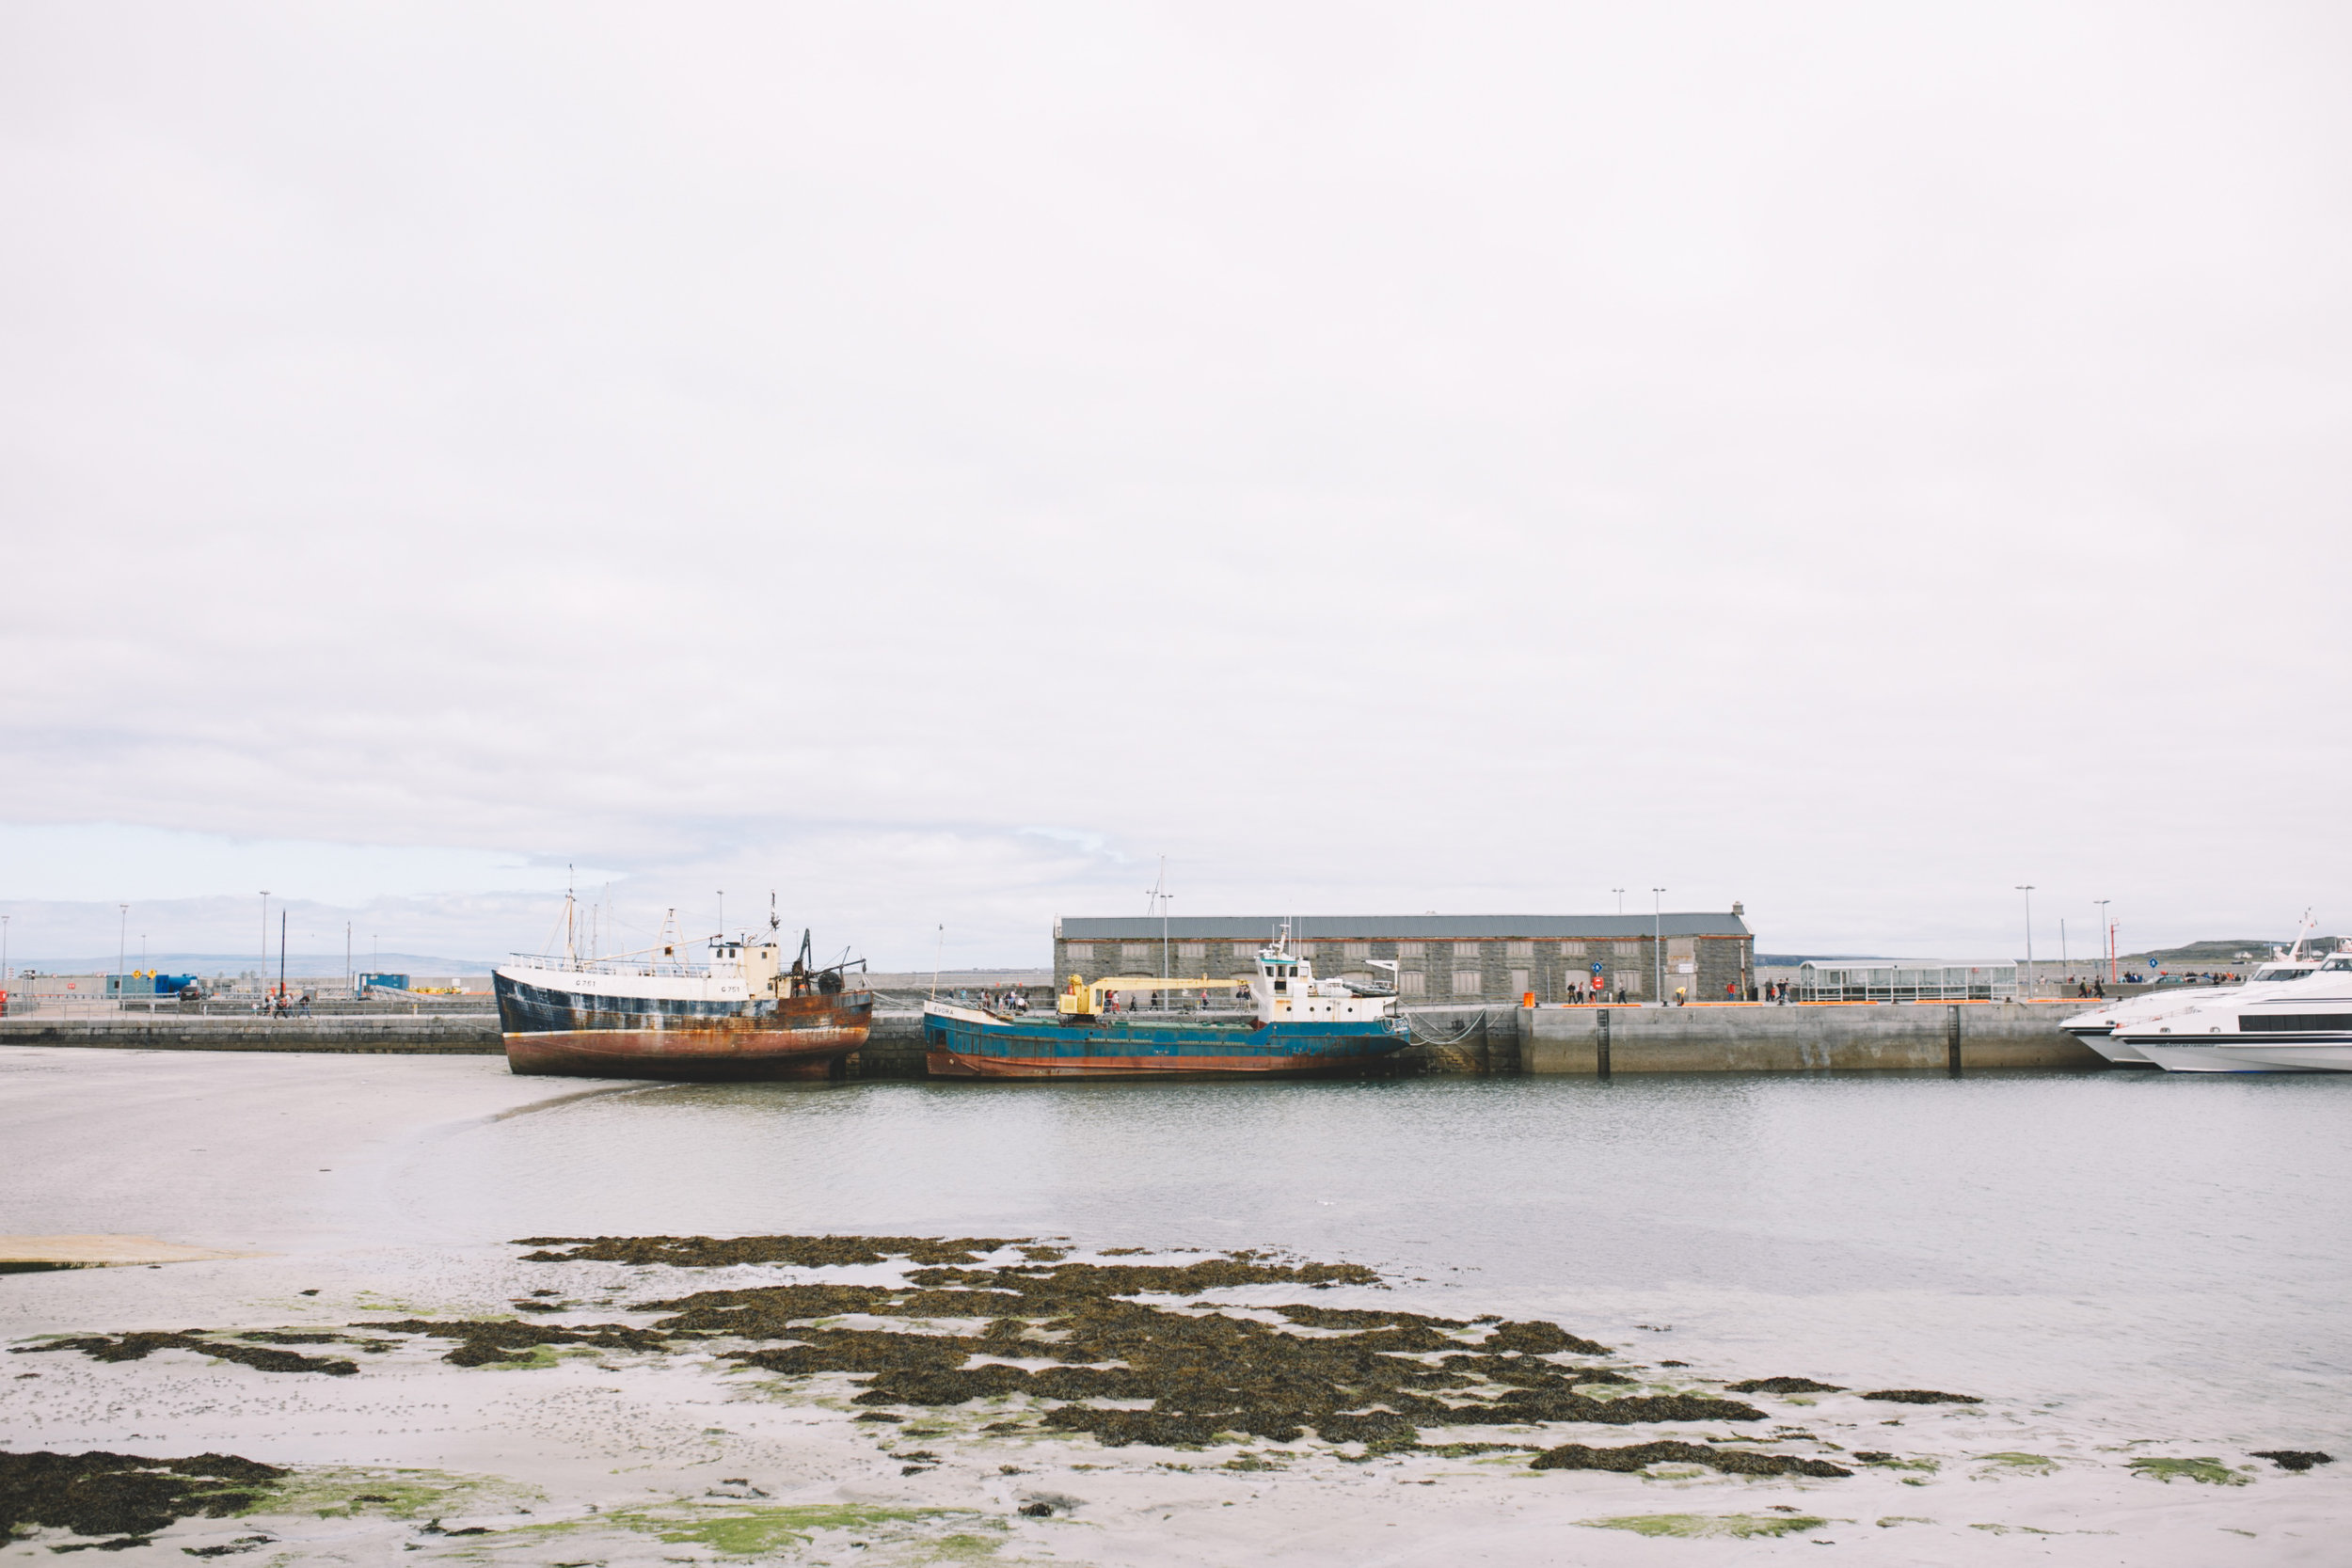 10 Tear Anniversary Trip - Aran Island Inis Mor Inis Orr Ireland  (72 of 73).jpg